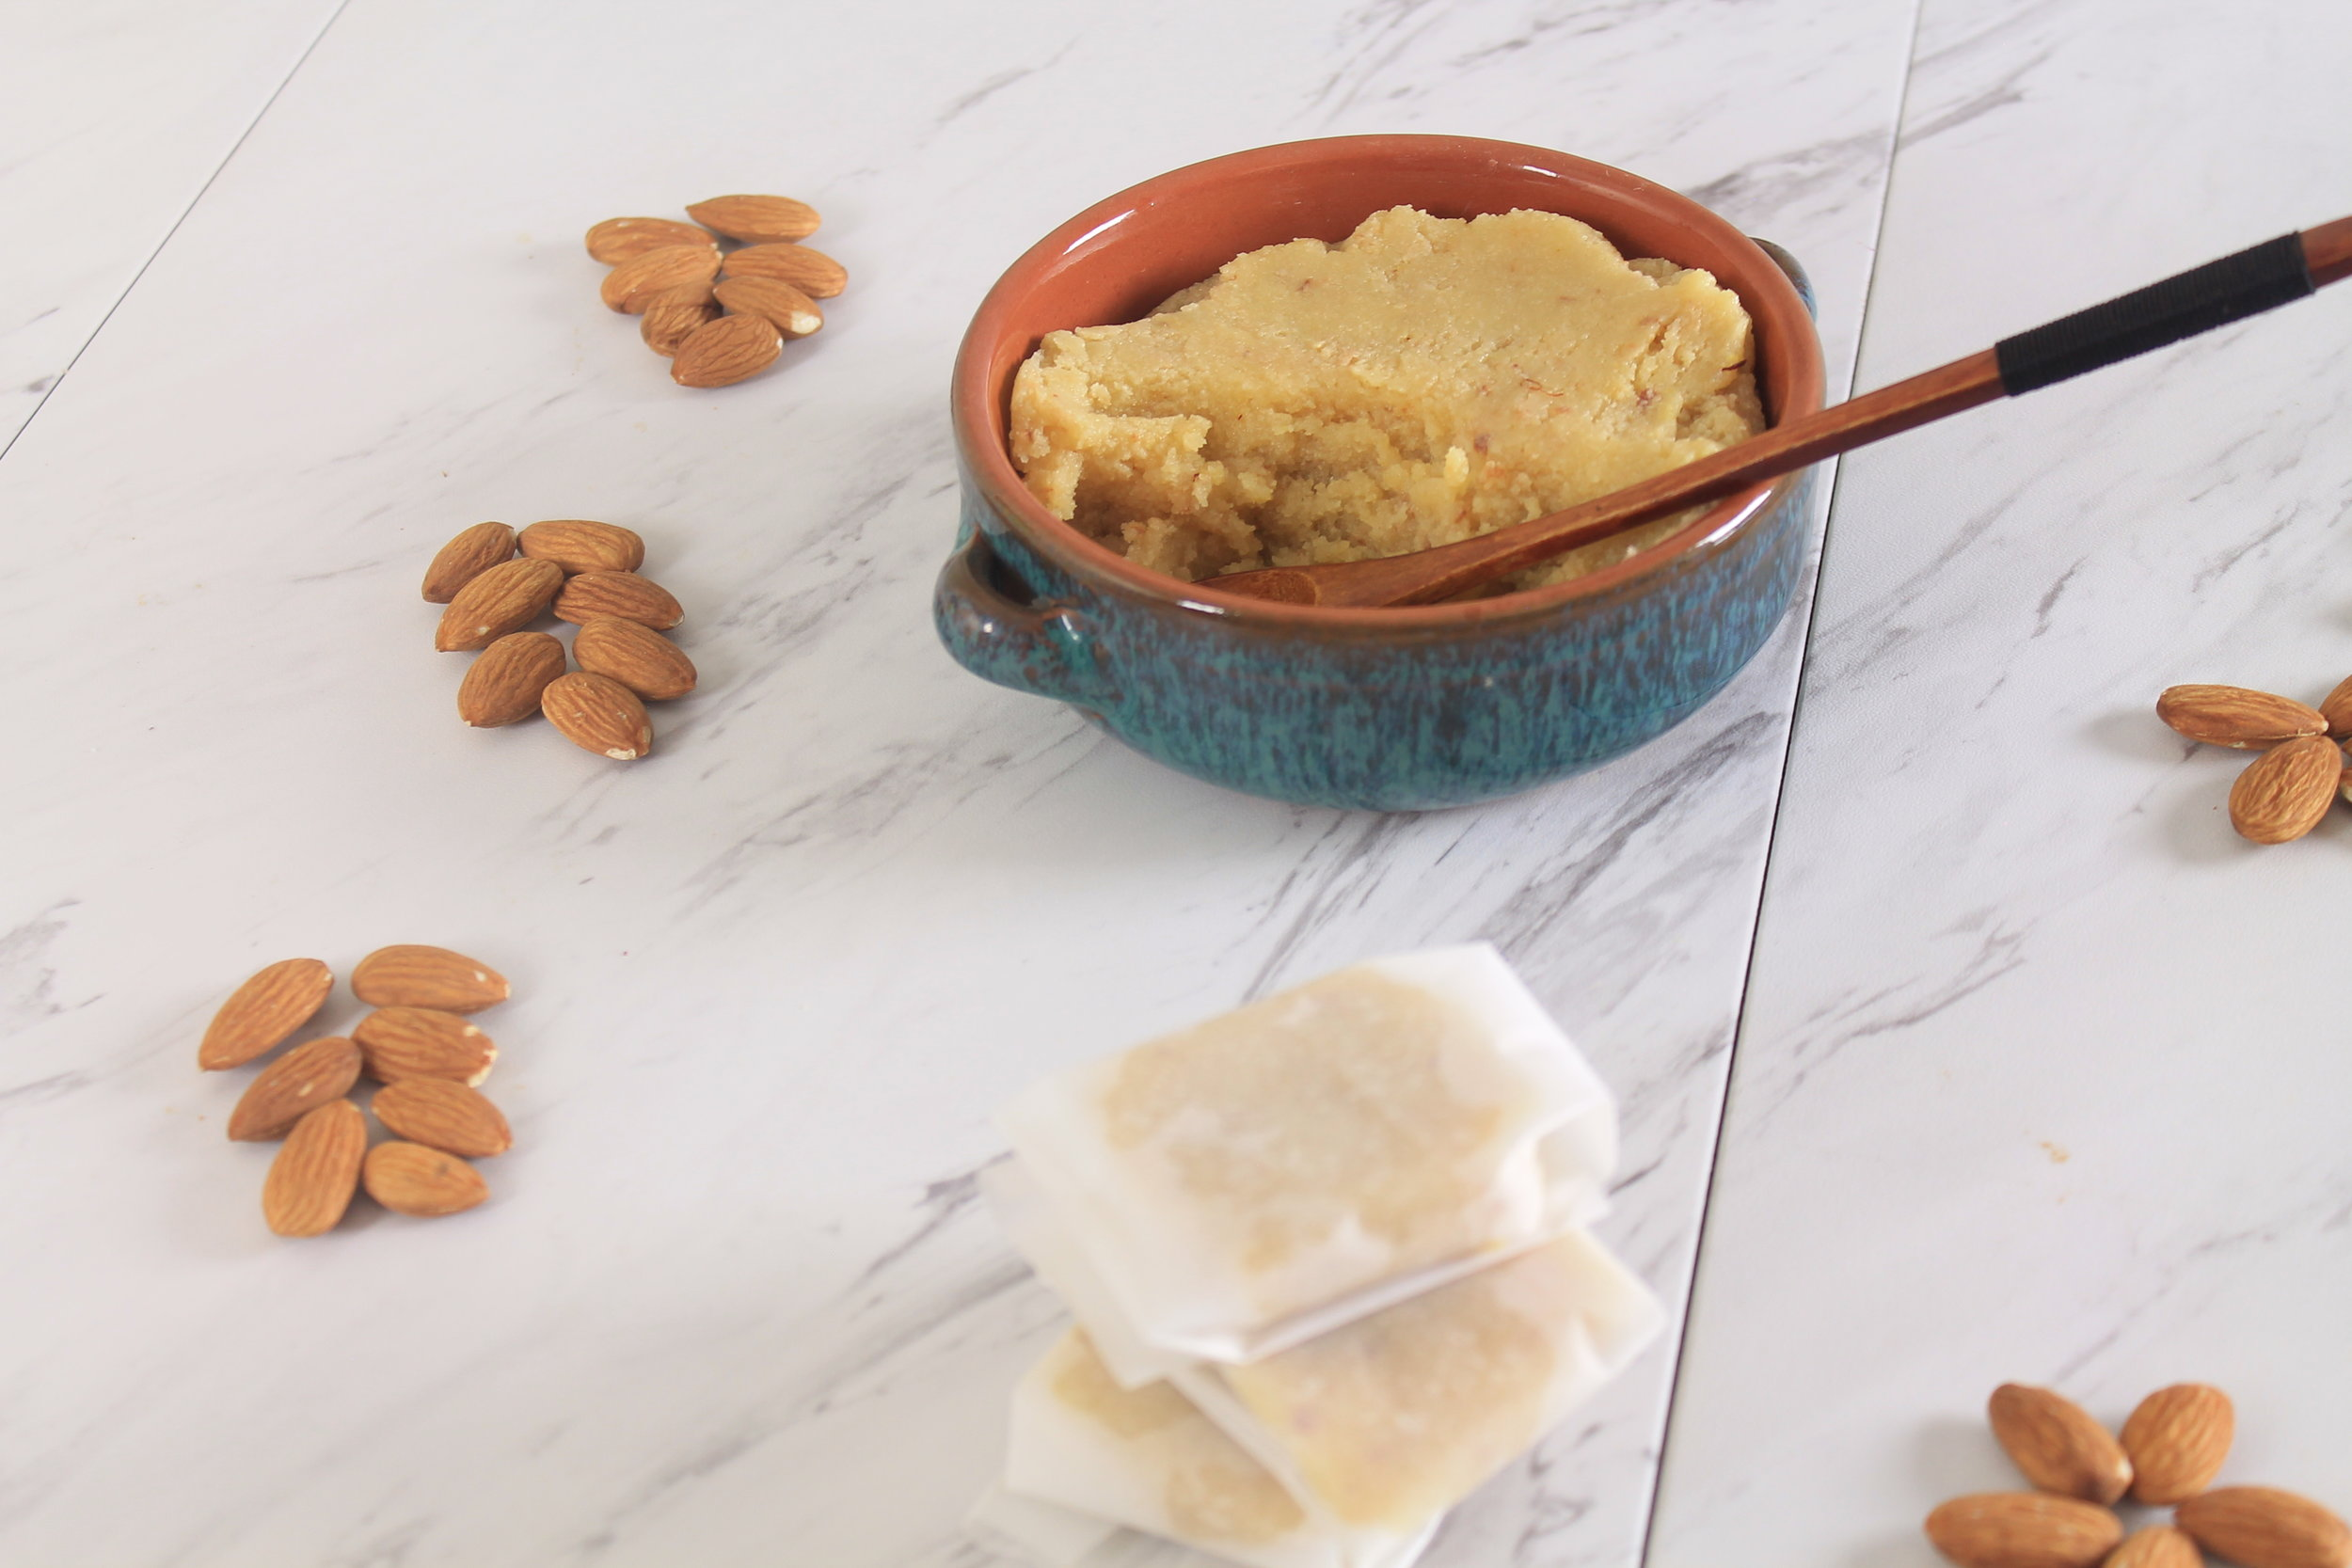 Badam Halwa with almond meal